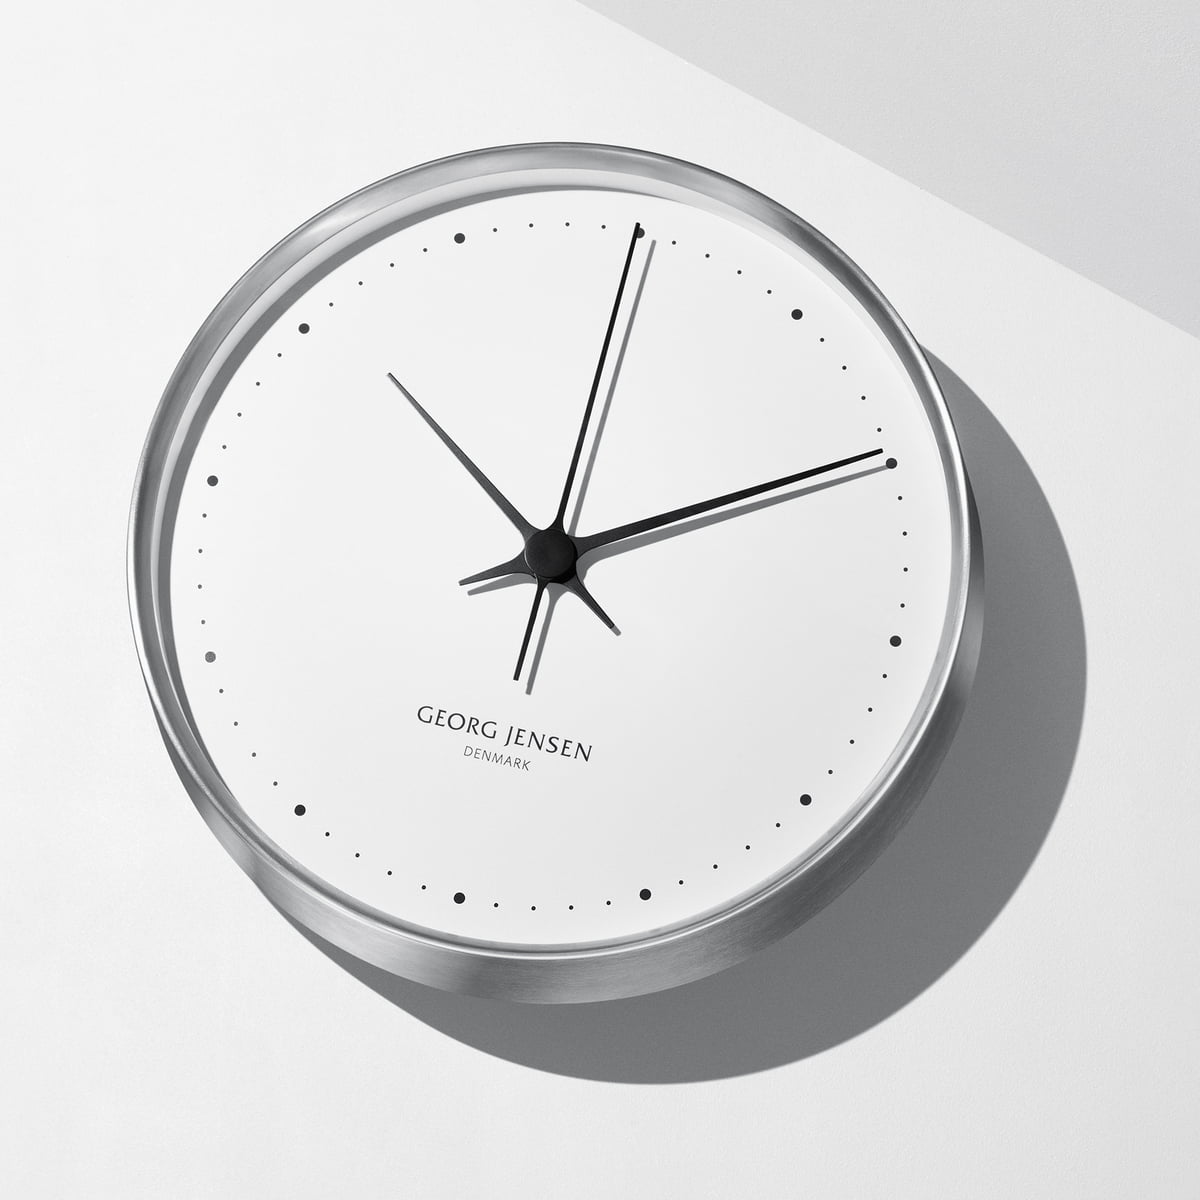 wall clock by henning koppel for georg jensen - georg jensen  henning koppel wall clock Ø  cm stainless steel  white